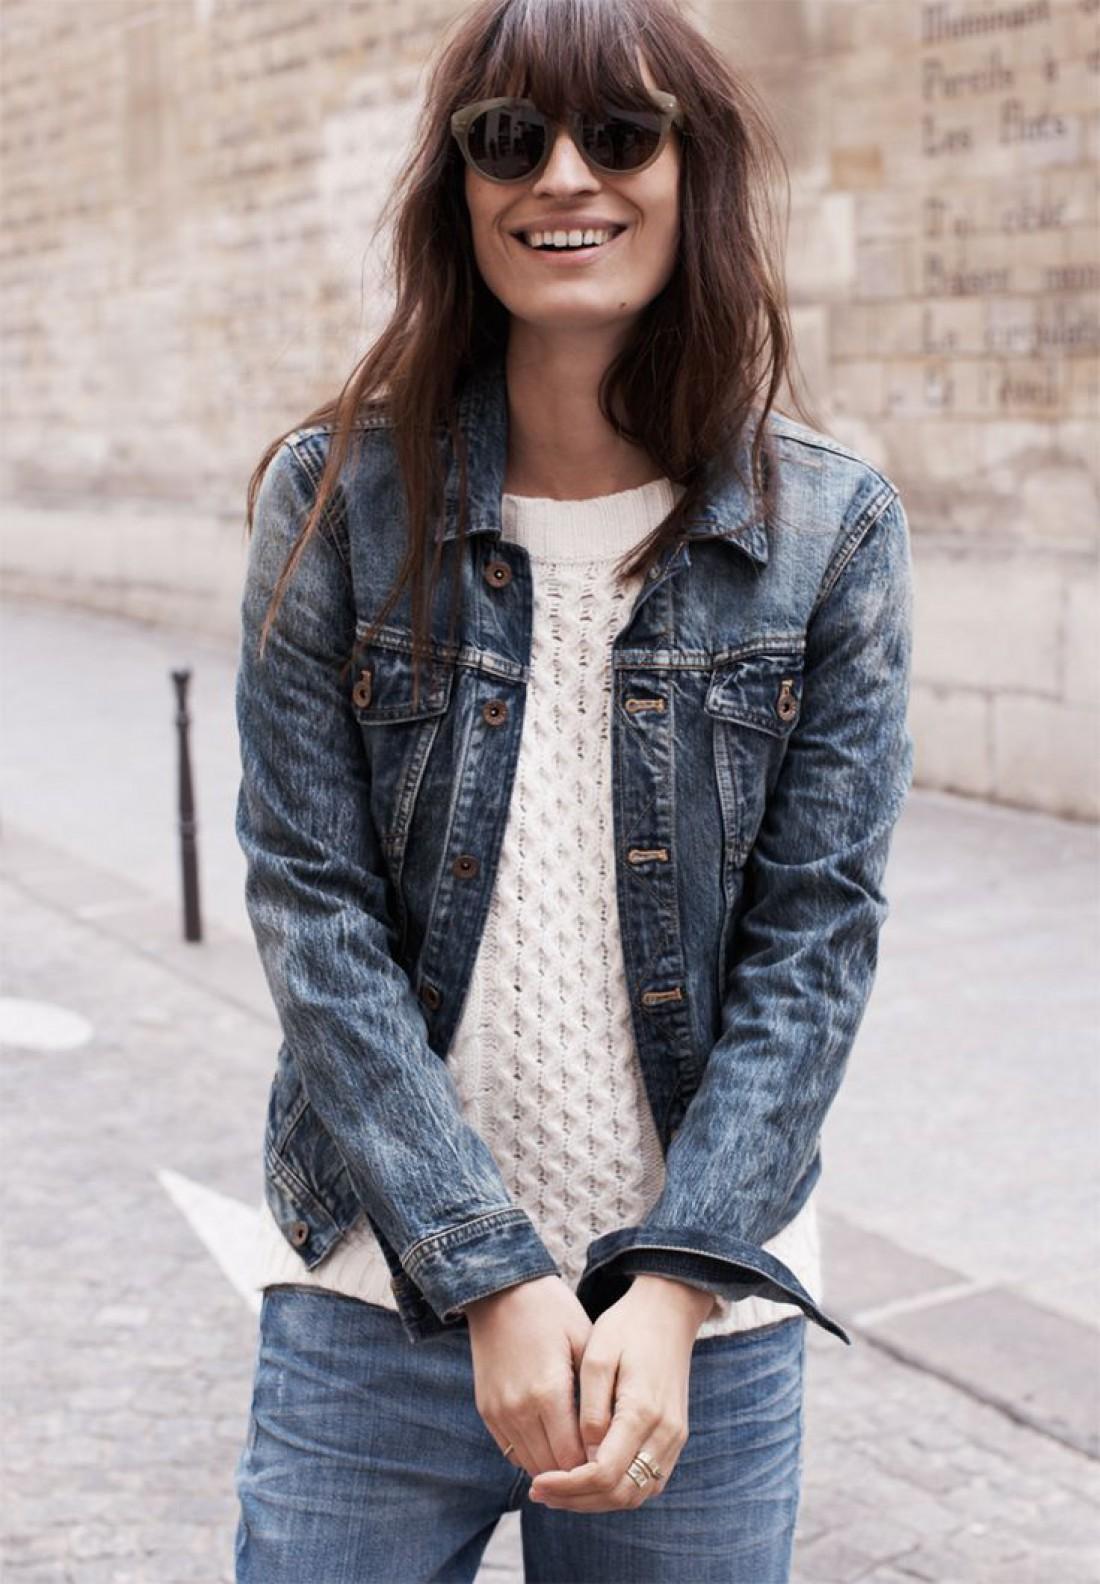 Французская модель Каролин Де Мегрэ